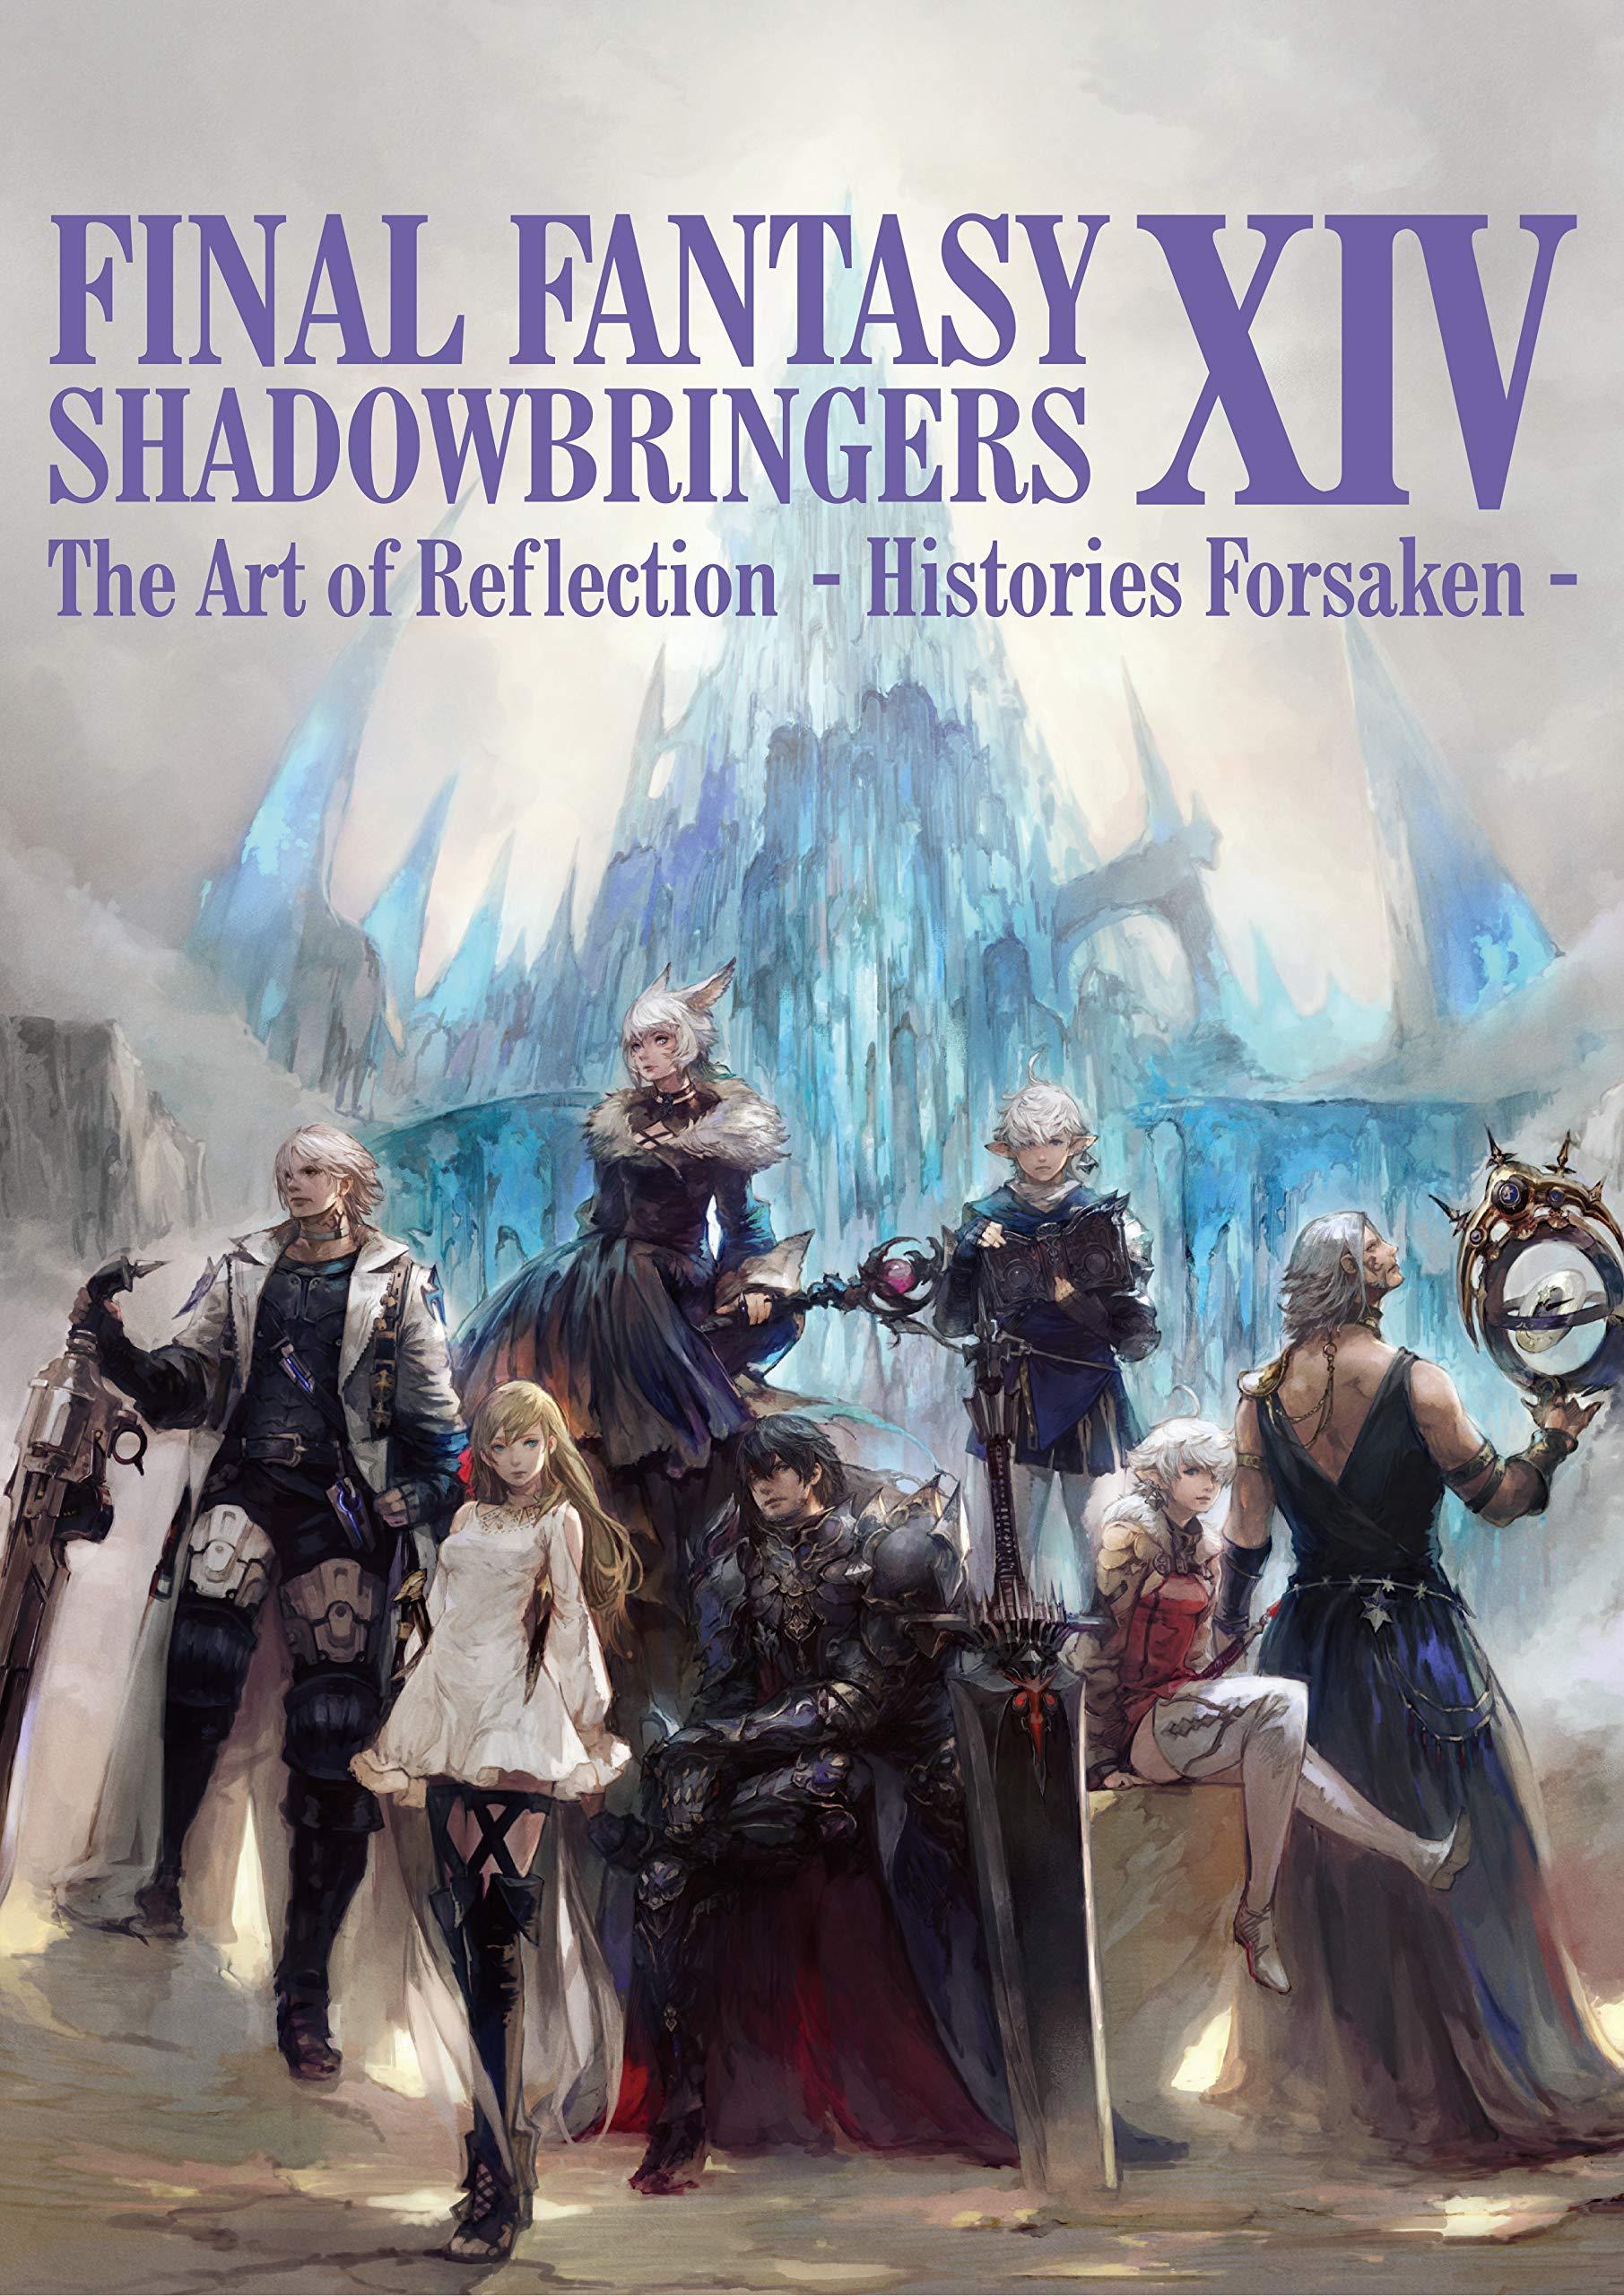 Final Fantasy XIV: Shadowbringers The Art of Reflection -Histories Forsaken-